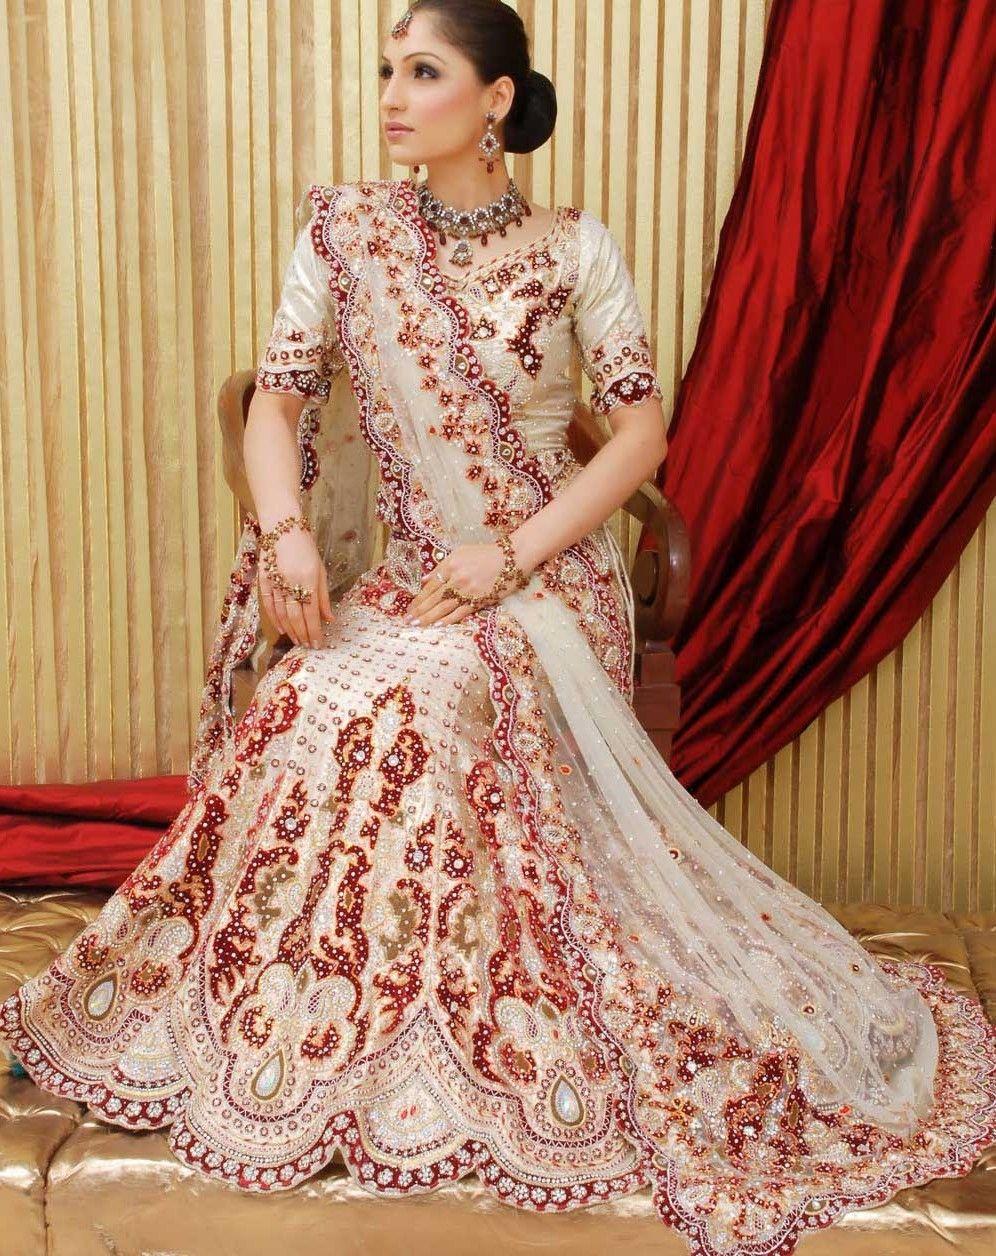 indian wedding photography design%0A IndianBridalLehengaCollection     www shopprice com au